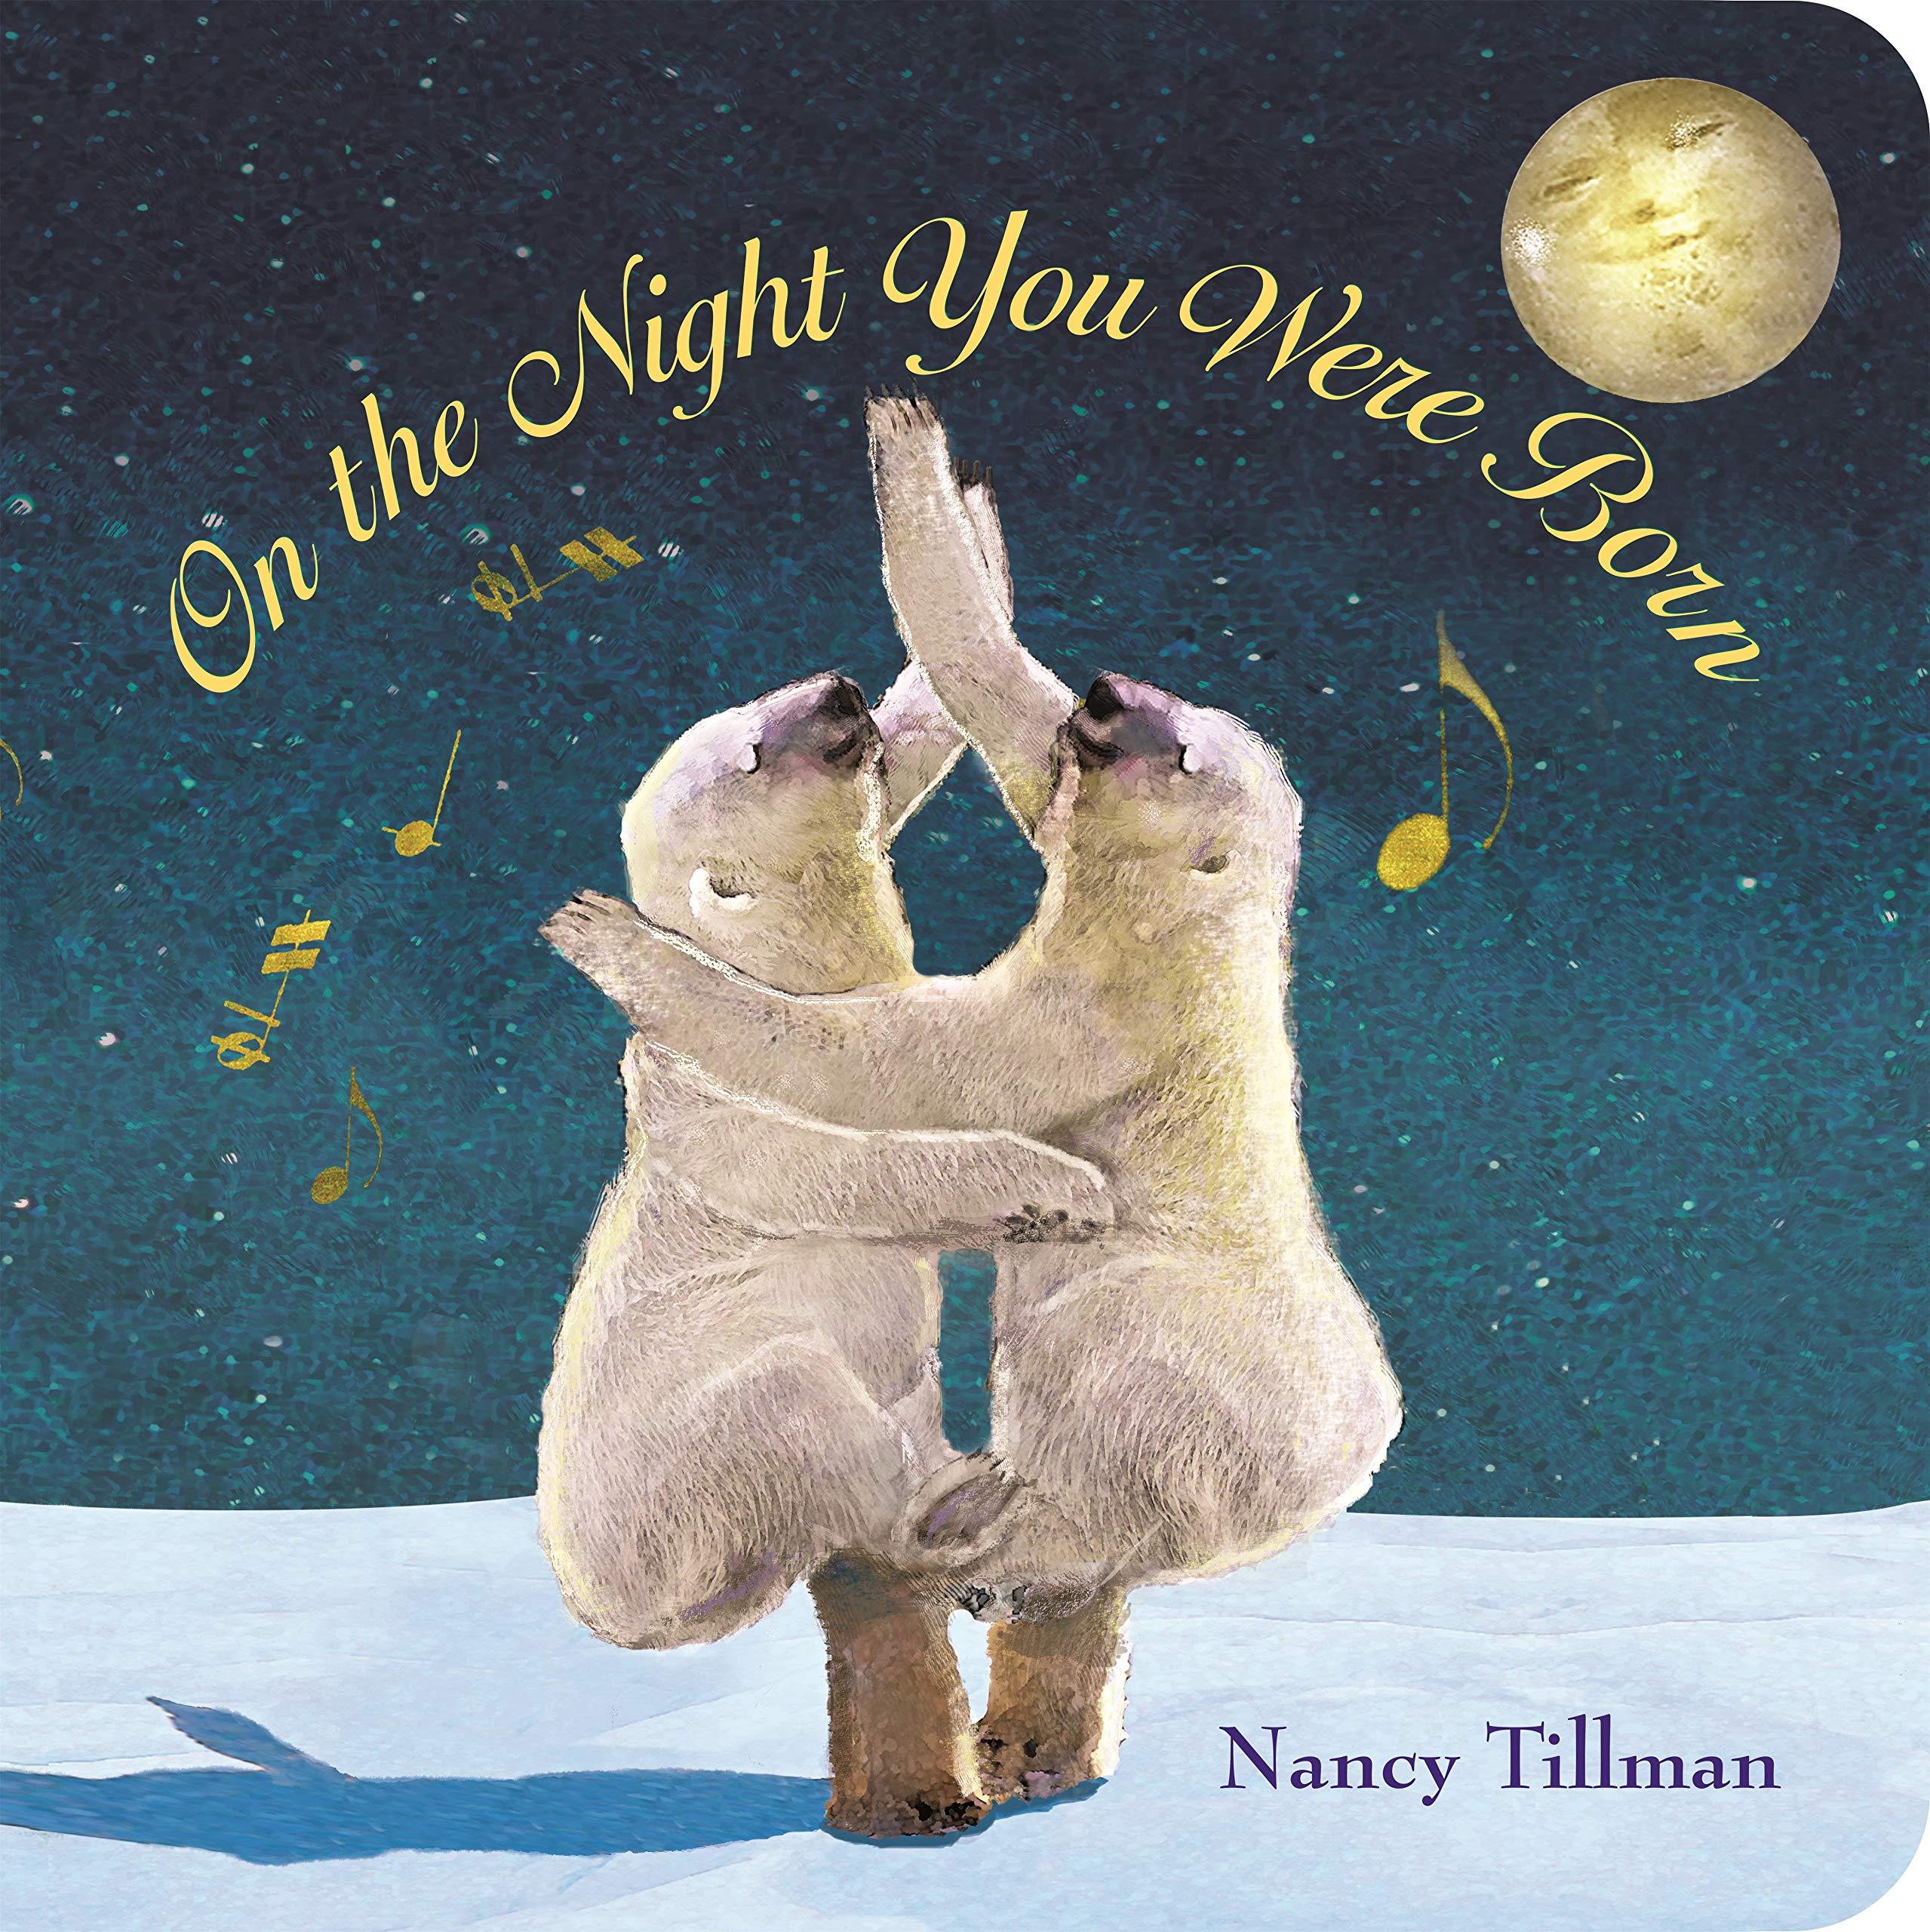 On The Night You Were Born Nancy Tillman 9780312601553 Amazoncom